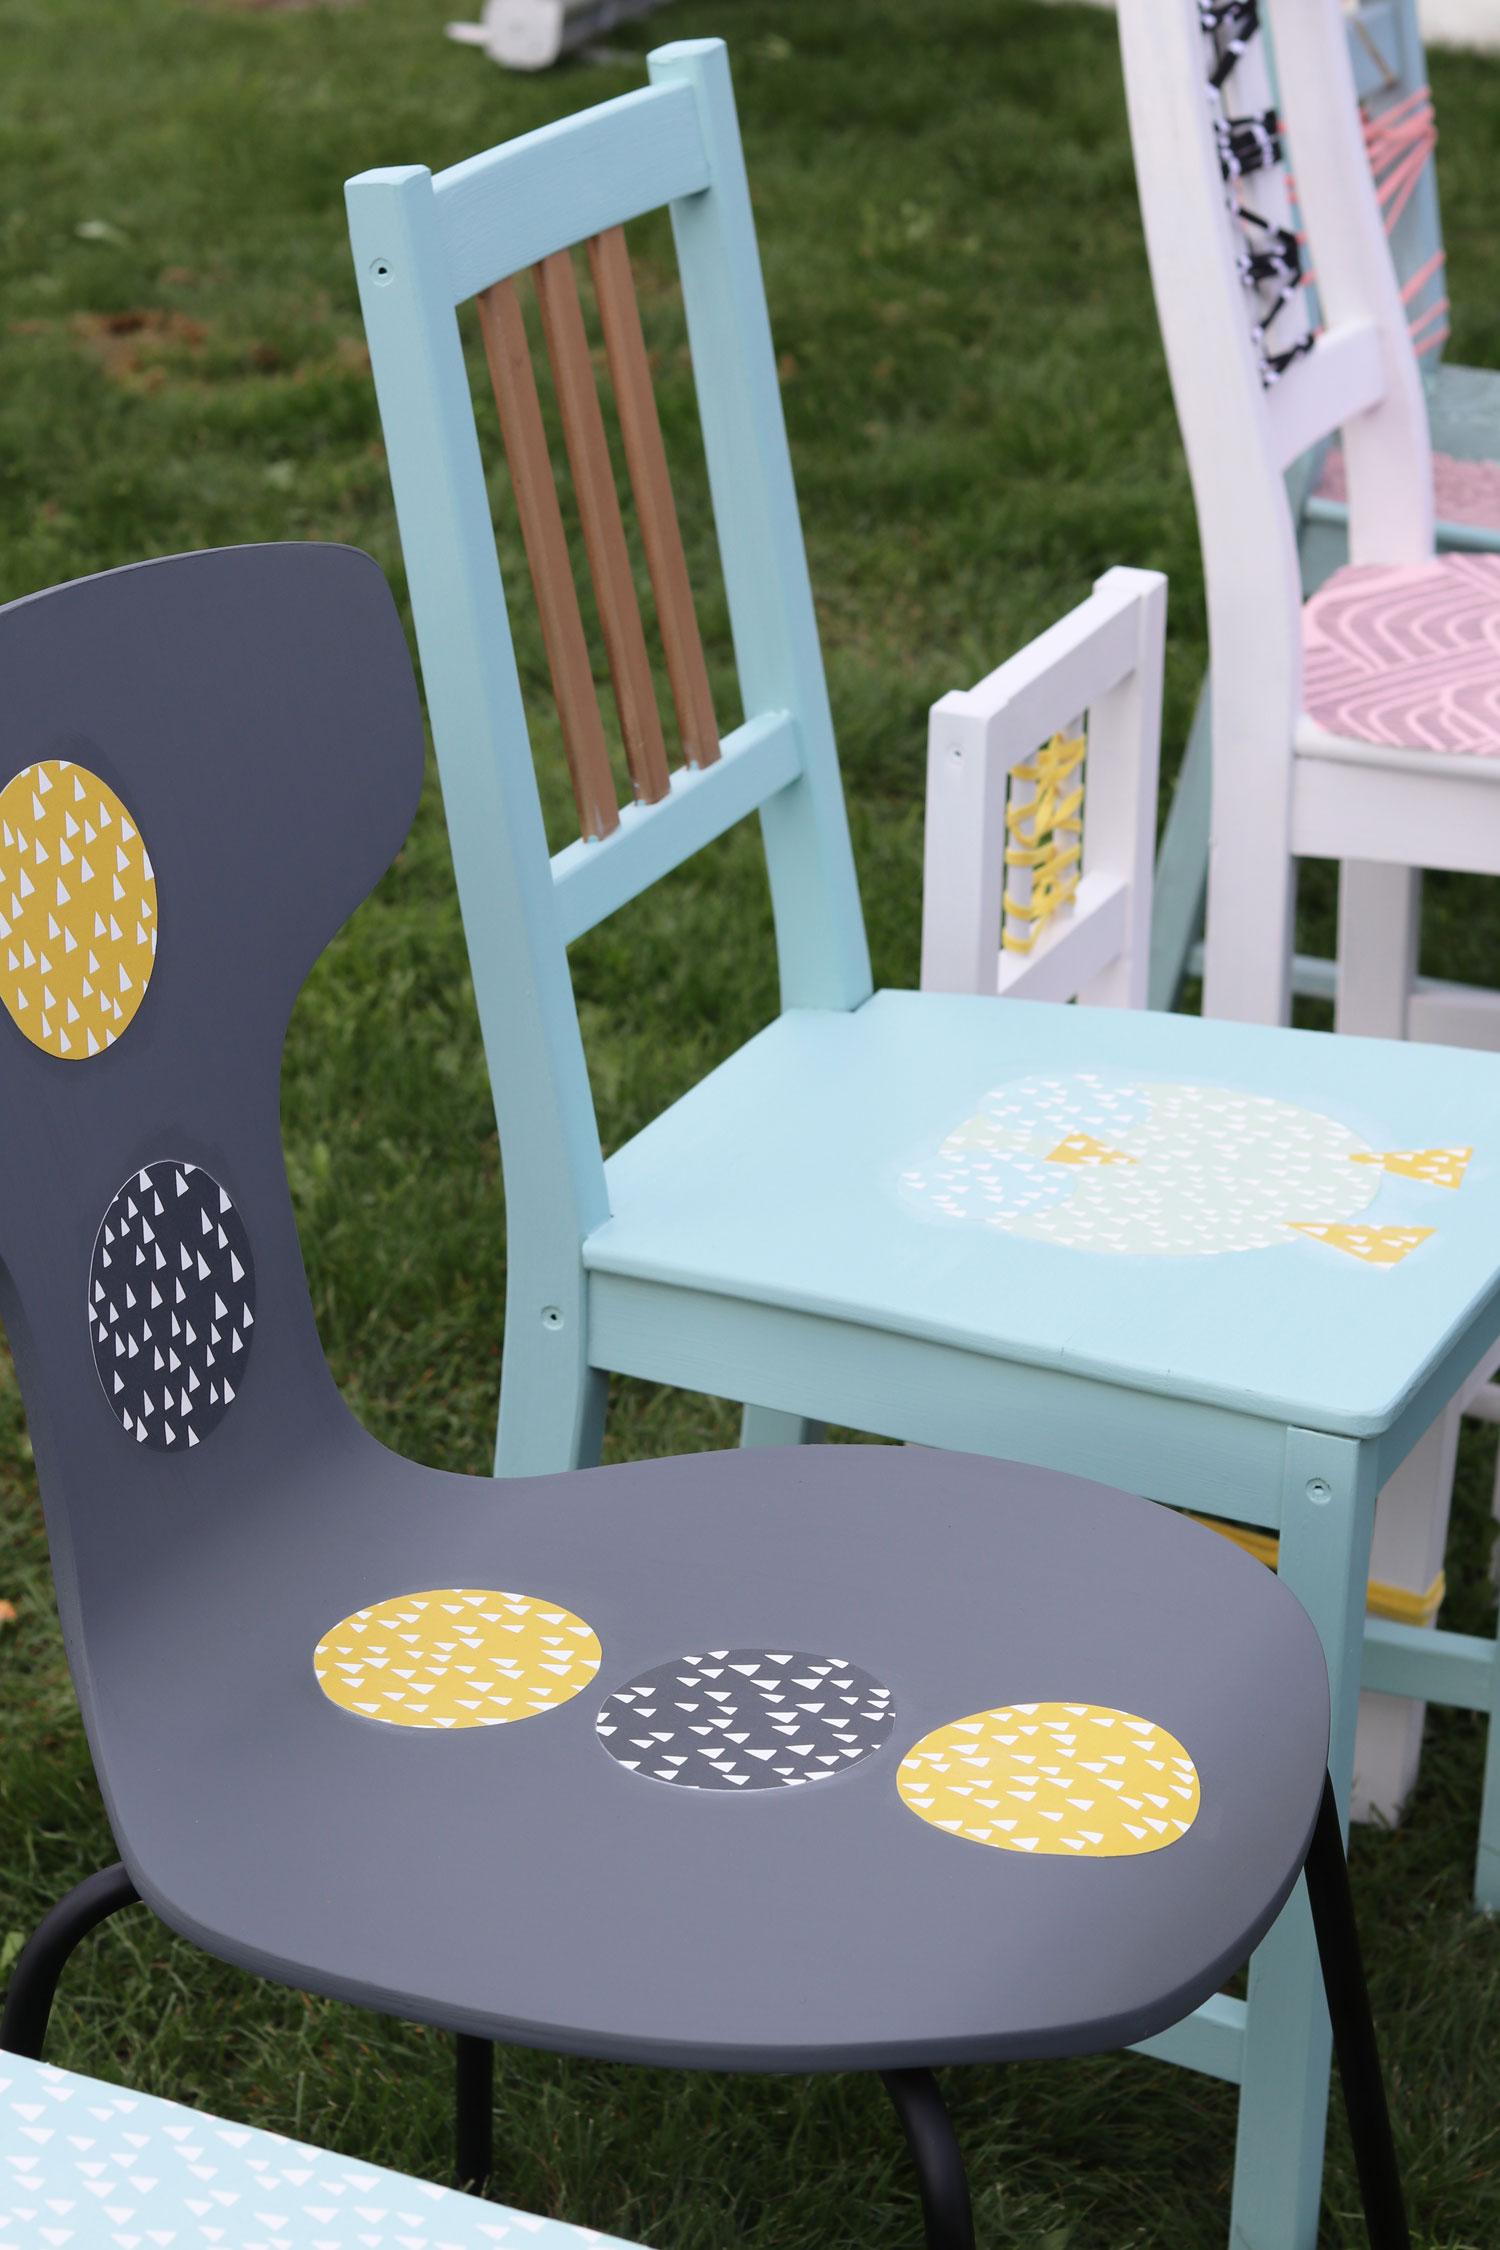 kreativa-karin-stolar-pyssel-med-tapet-midbec